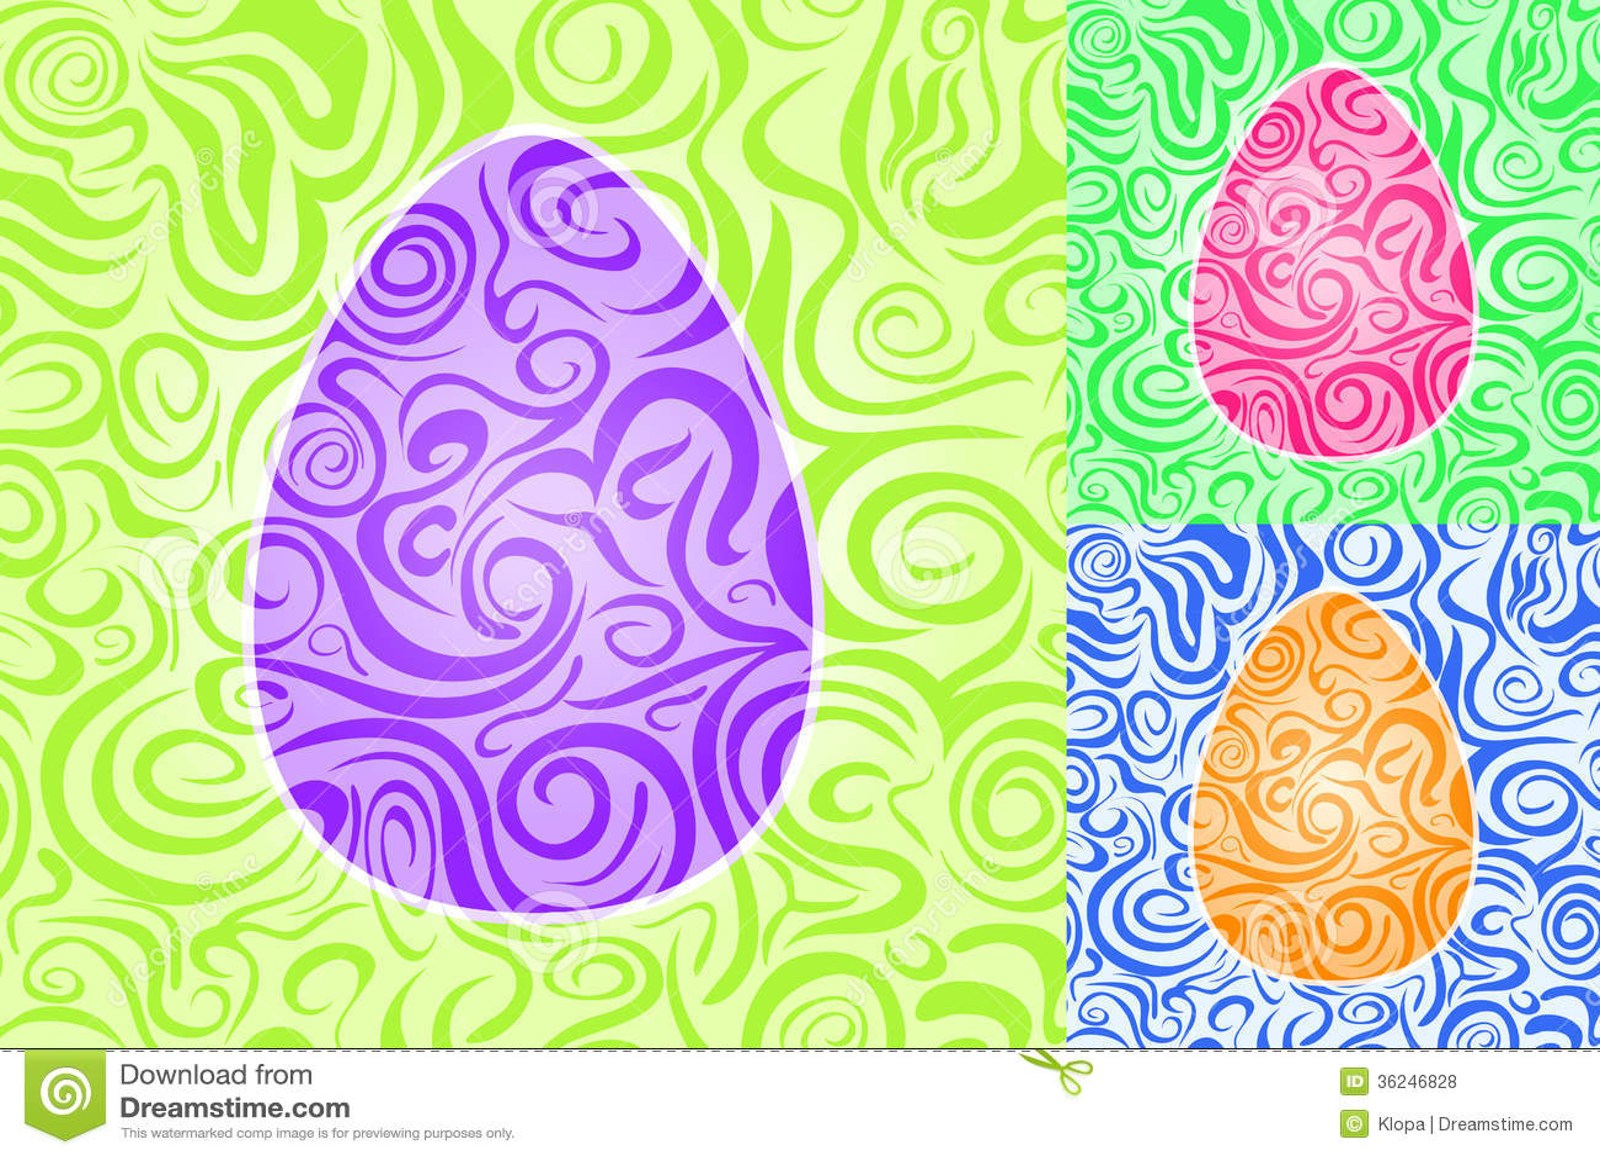 Sistema inconsútil del modelo del remolino del extracto de Pascua